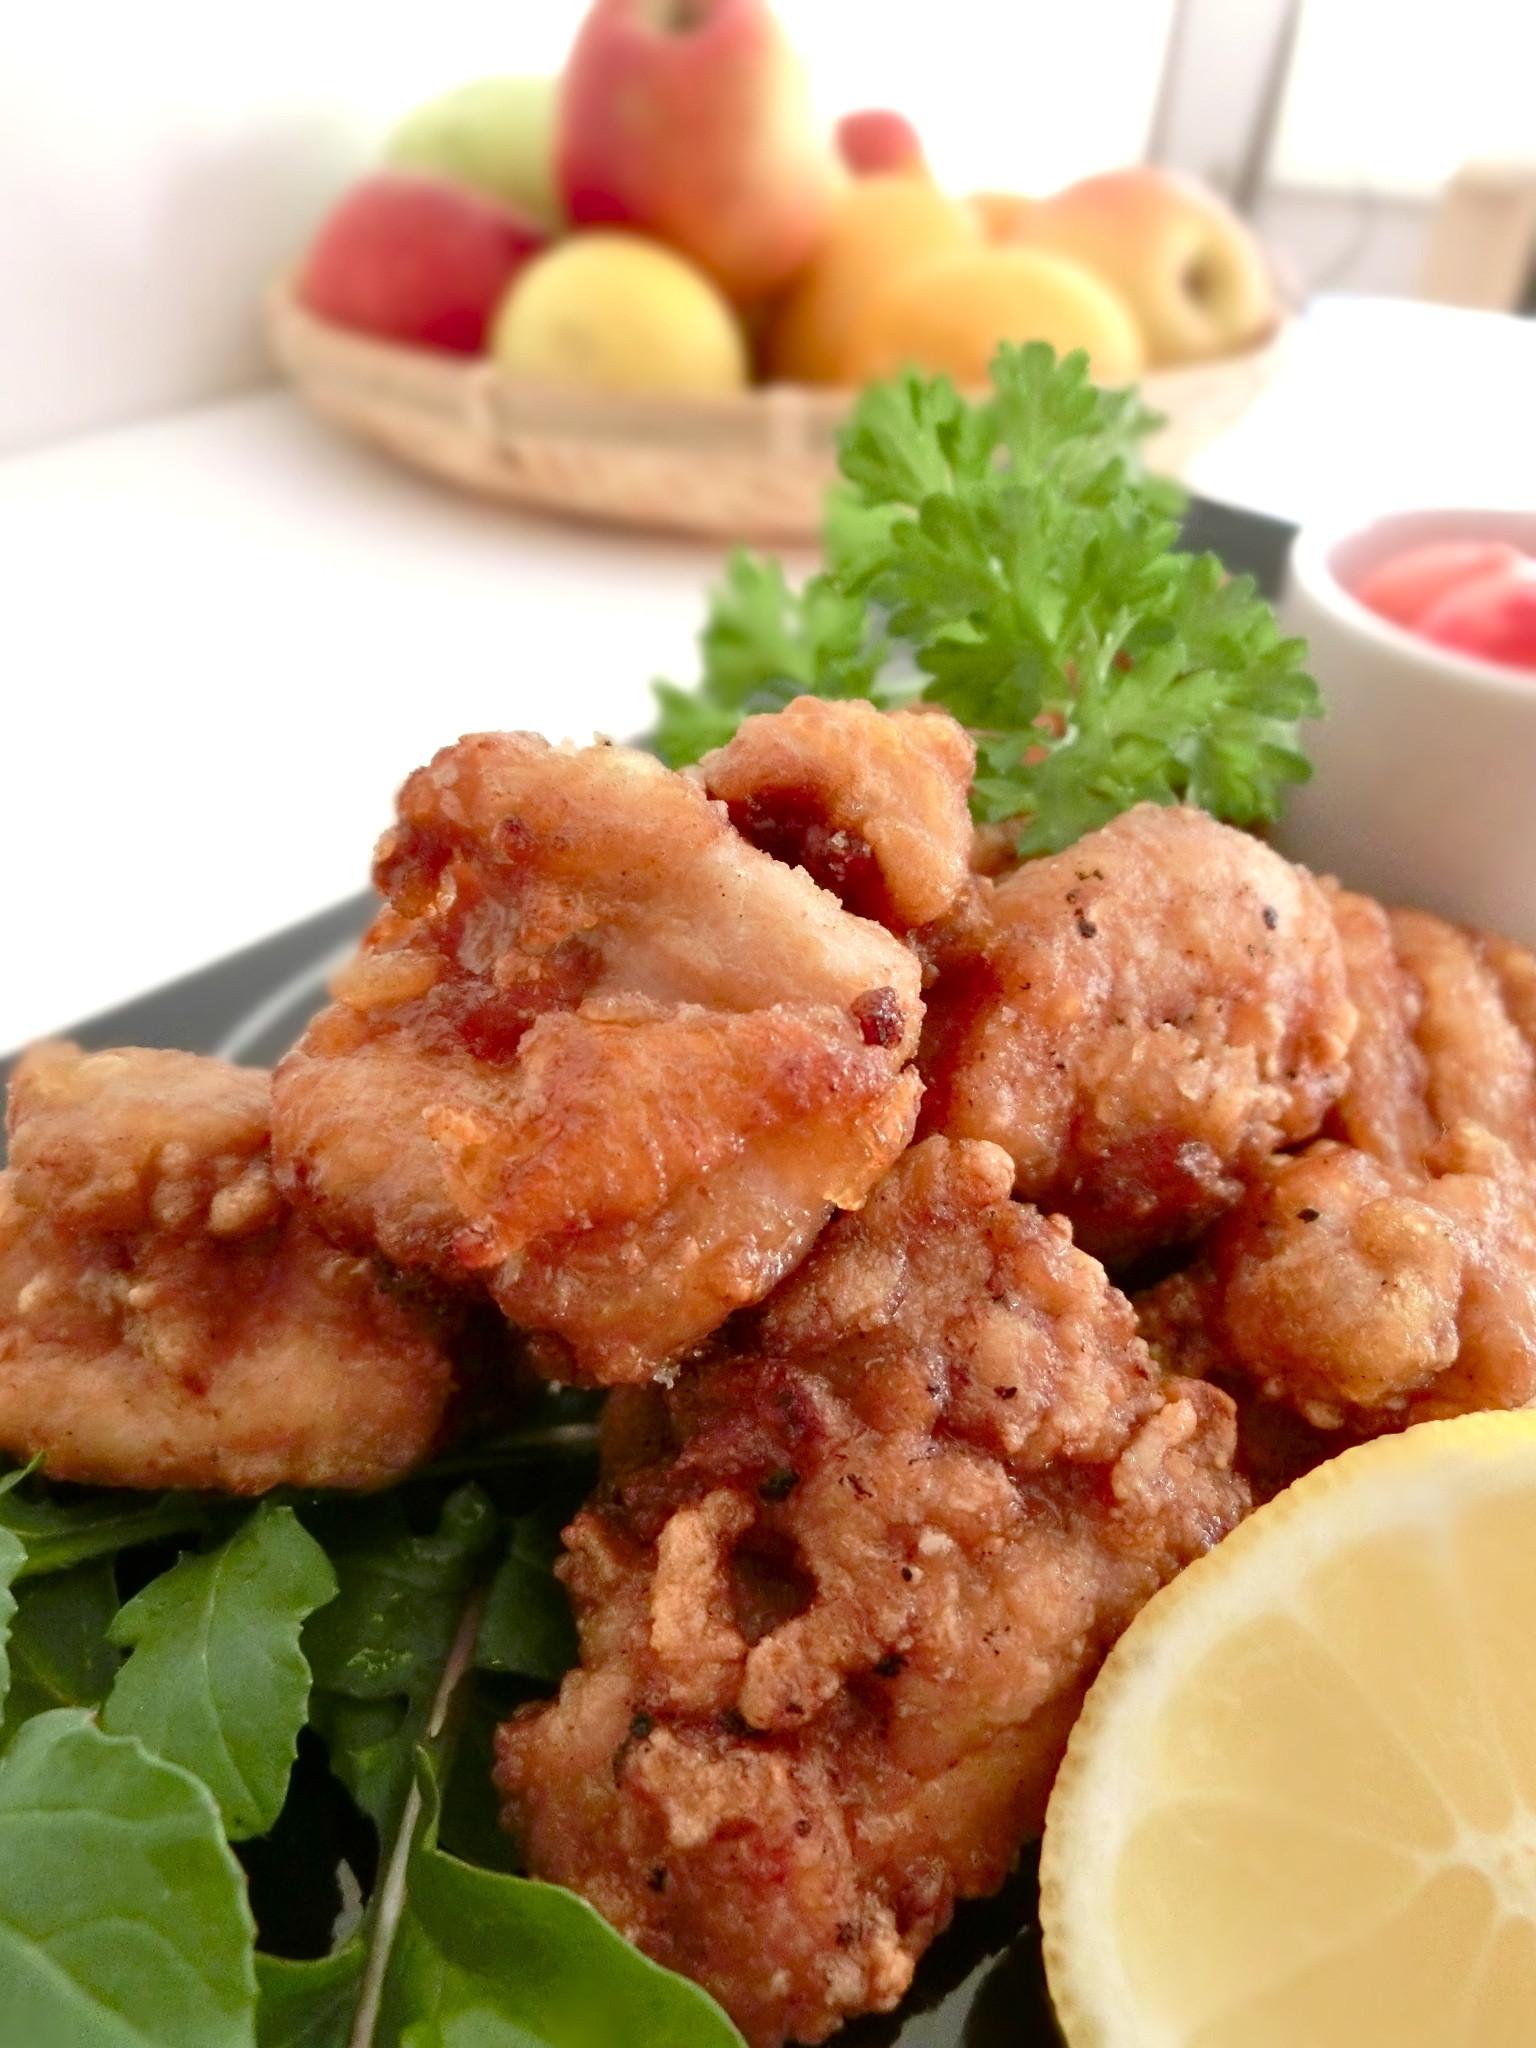 Fried Chicken Marinade  Japanese Crispy Fried Chicken – Marinated in Shio Koji